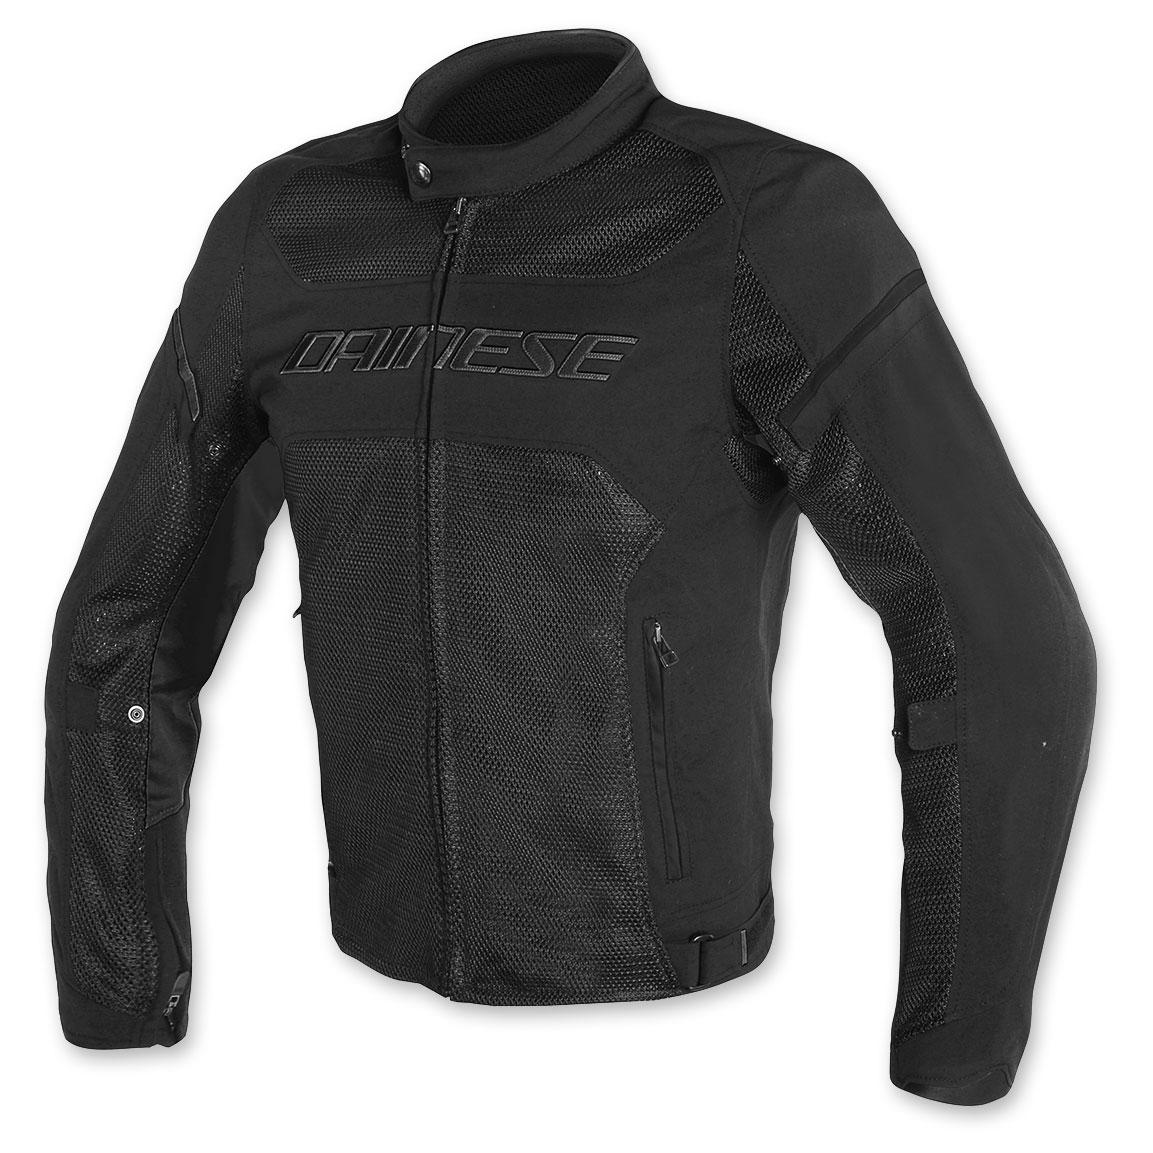 Dainese Men's Air Frame D1 Black/Black/Black Jacket